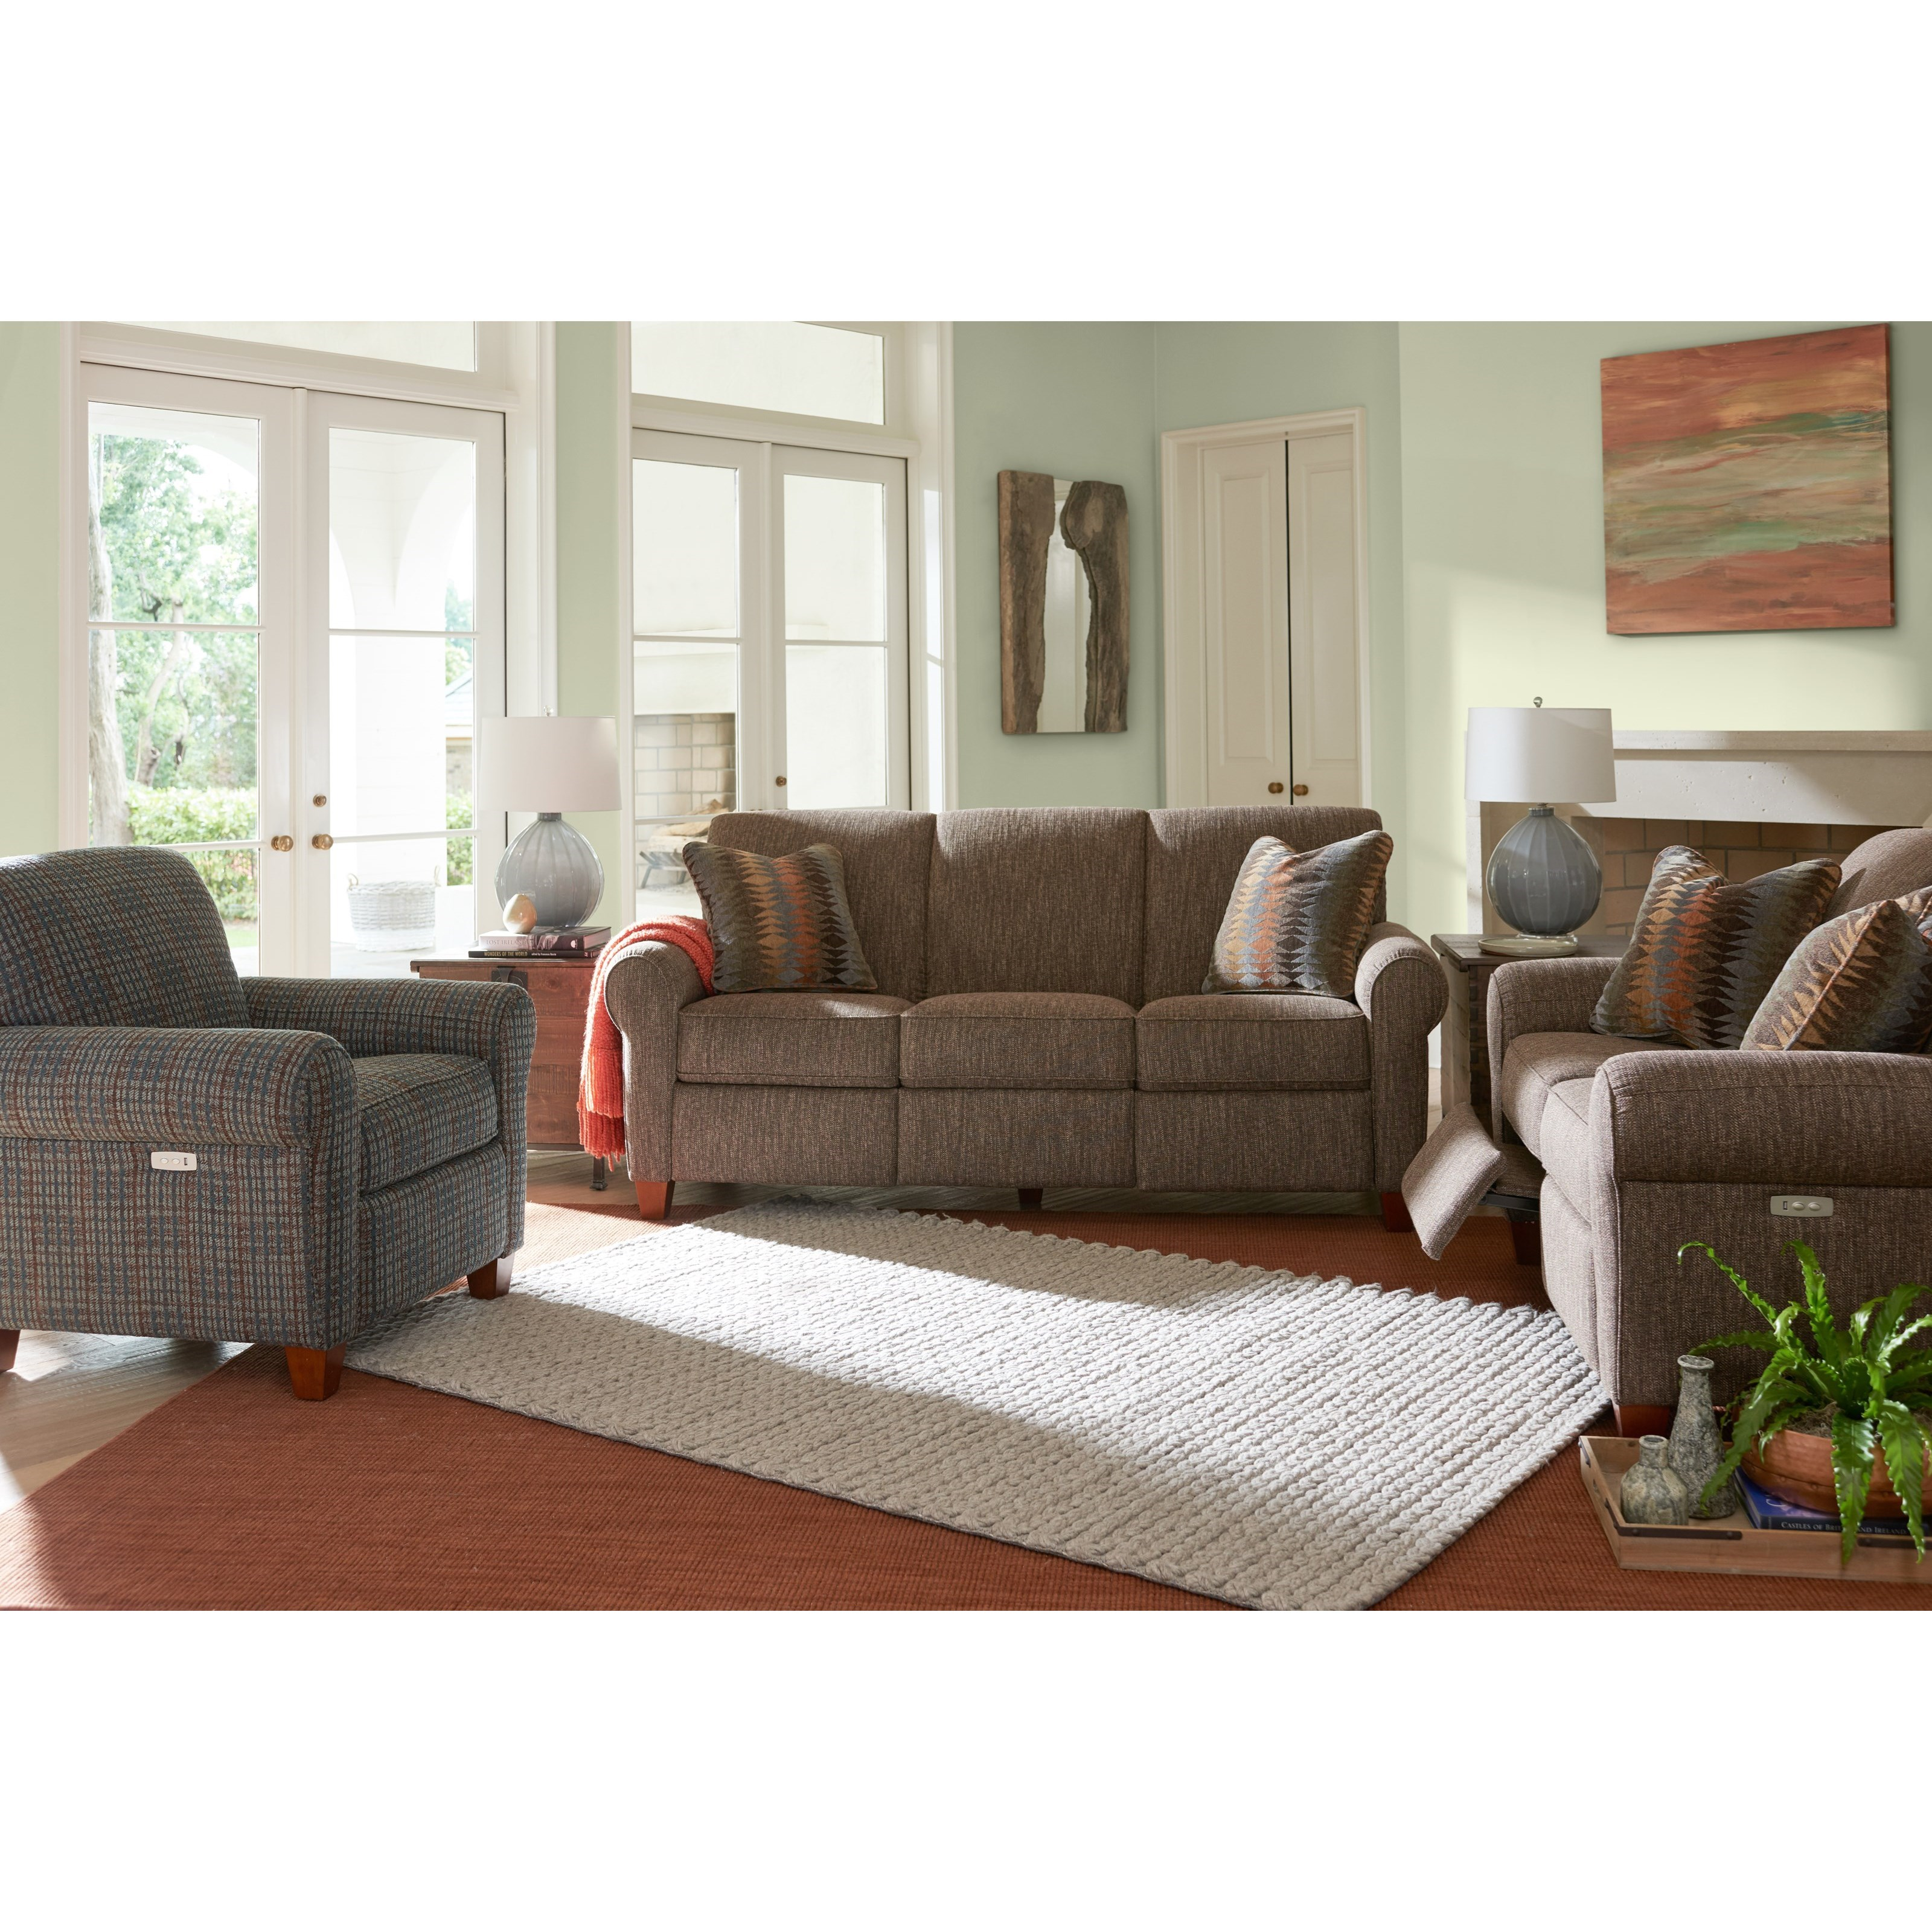 Bennett Reclining Living Room Group by La-Z-Boy at Jordan's Home Furnishings